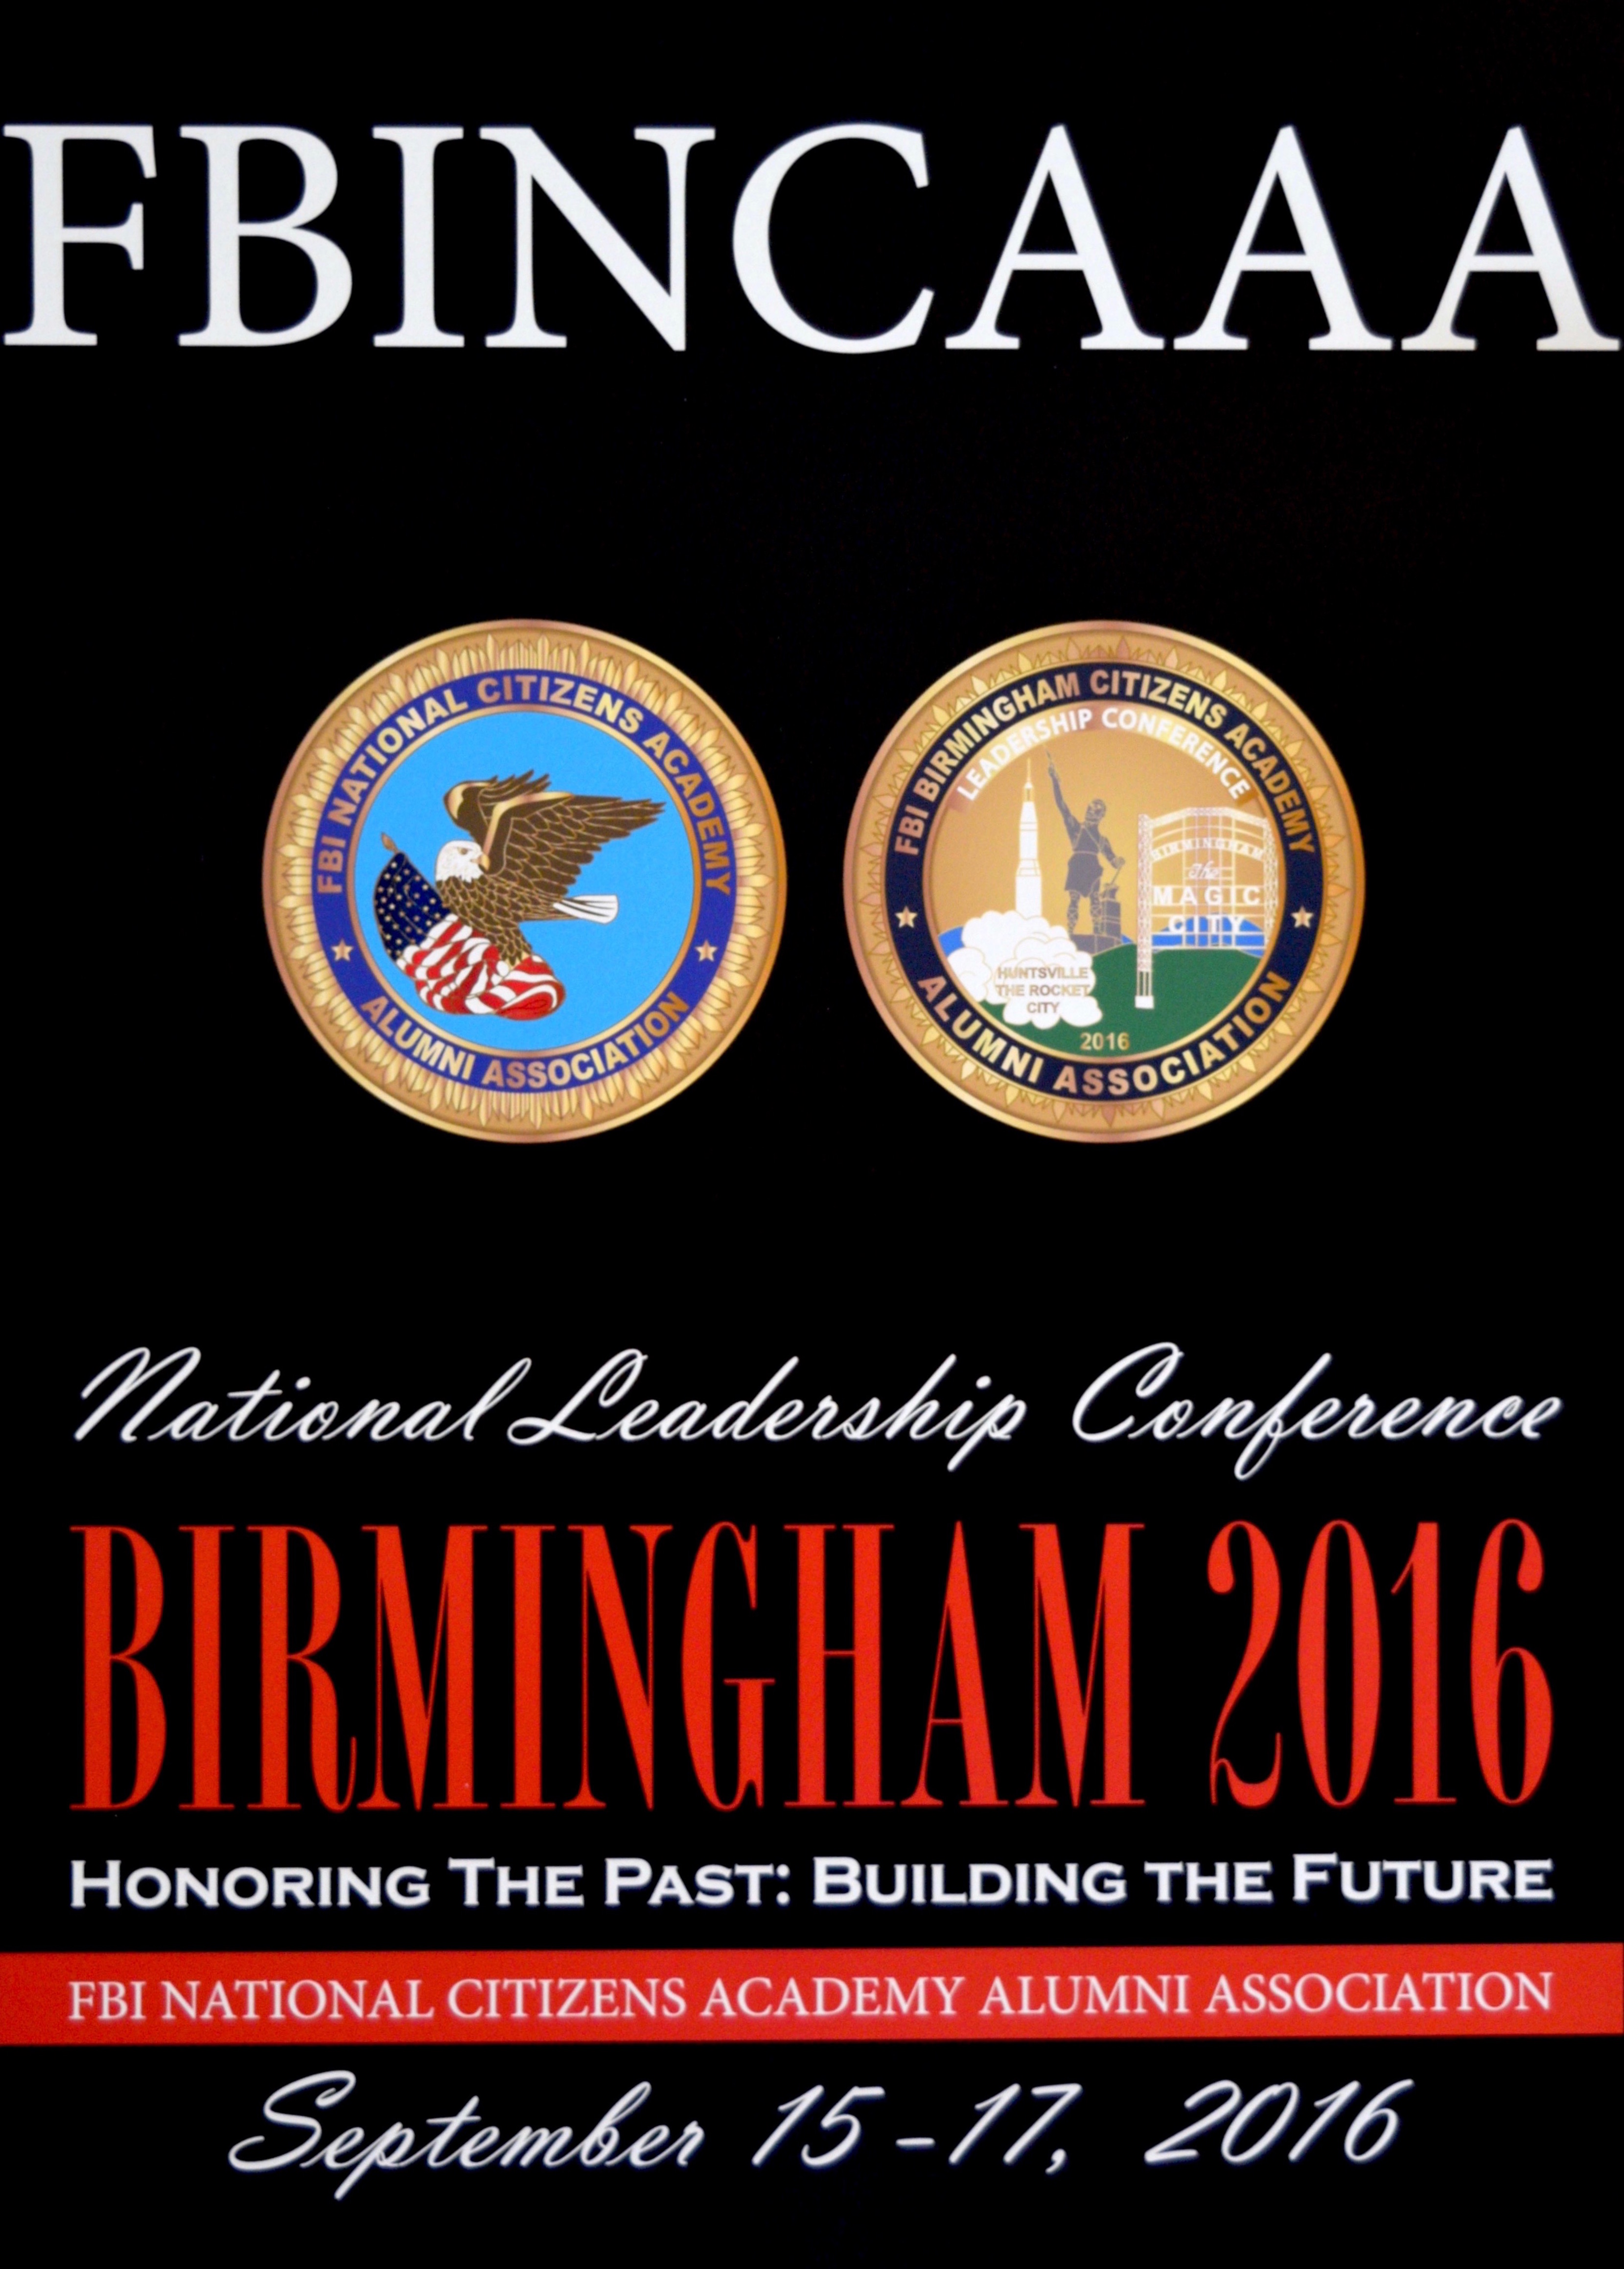 2016 NLC Birmingham